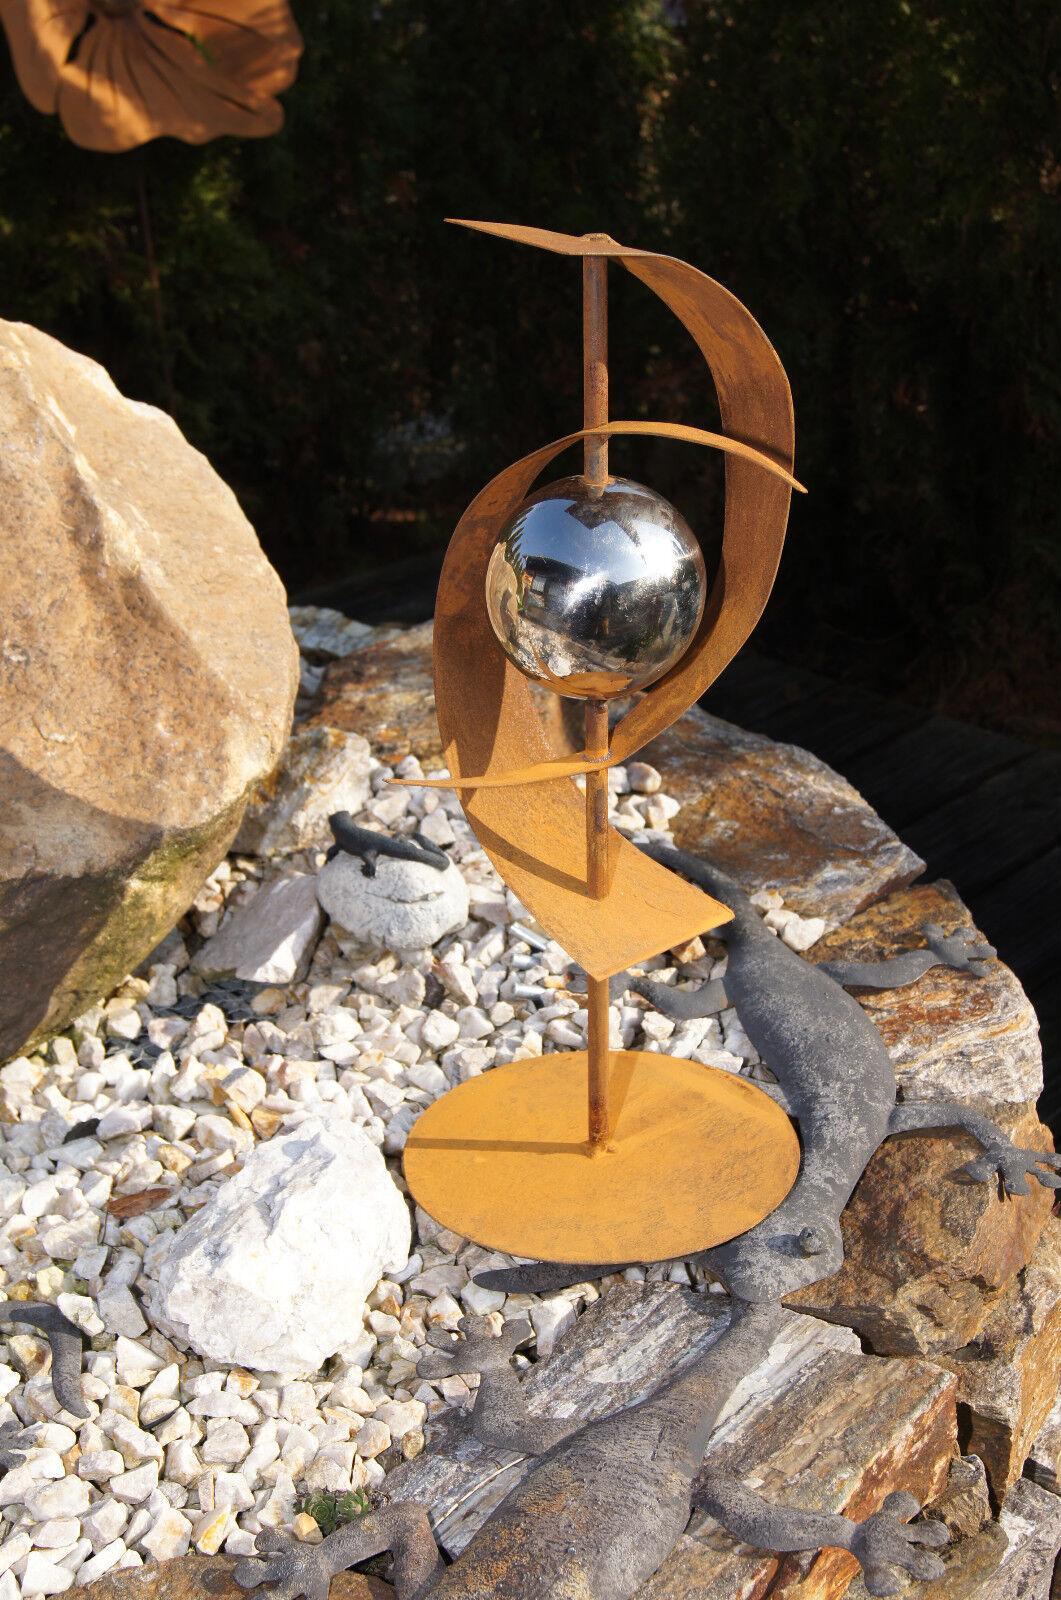 Skulptur futura edelrost rost metall gartendeko auch f r s ule neu eur 26 00 picclick de - Metall gartendeko ...